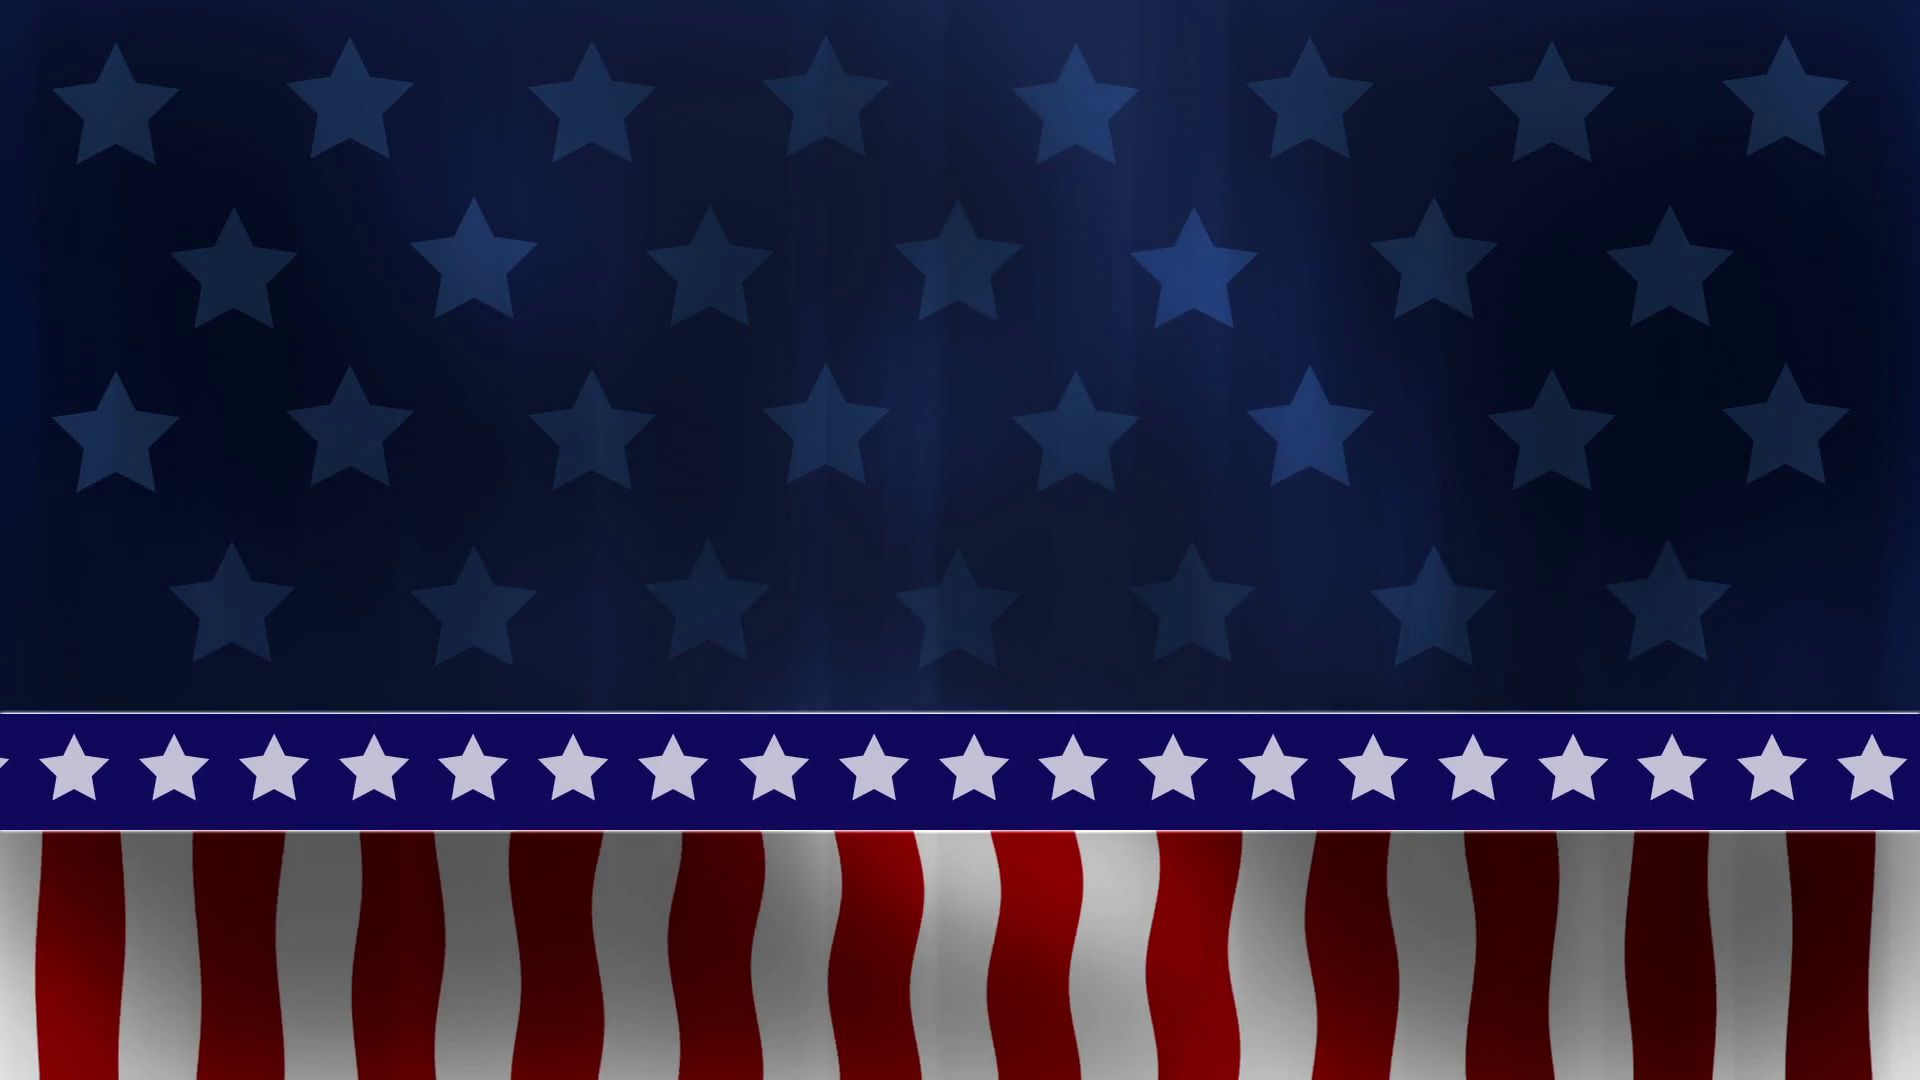 USA Patriotic Background Loop Motion Background.